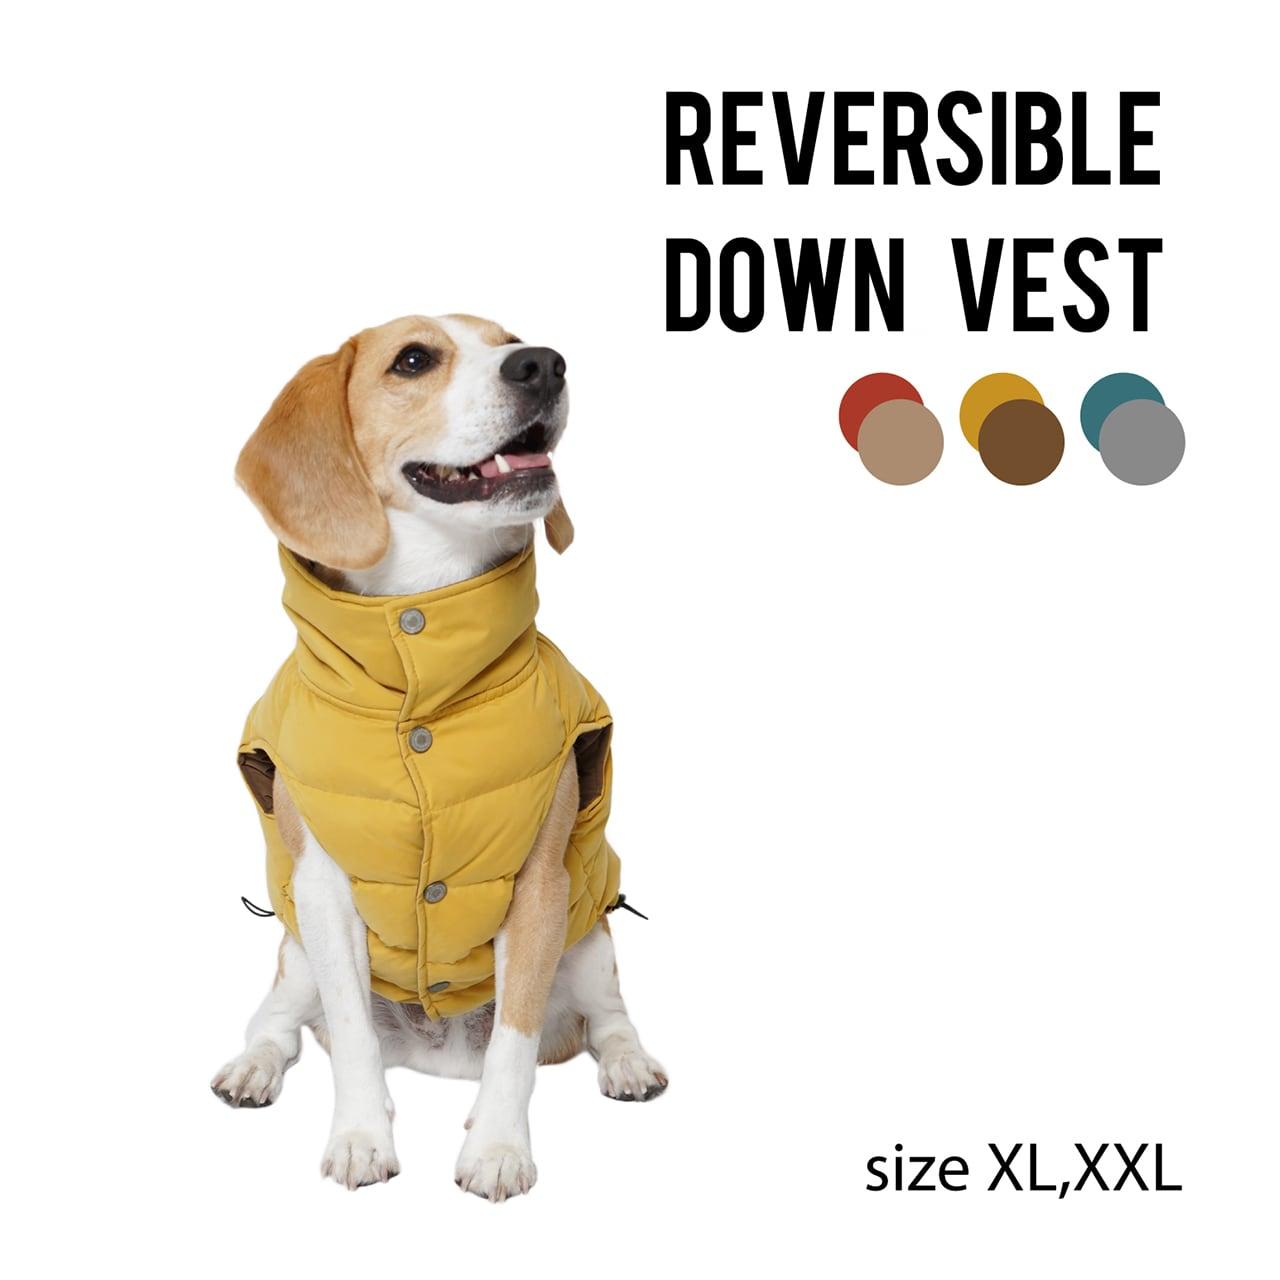 REVERSIBLE DOWN VEST(XL・XXL) リバーシブルダウンベスト